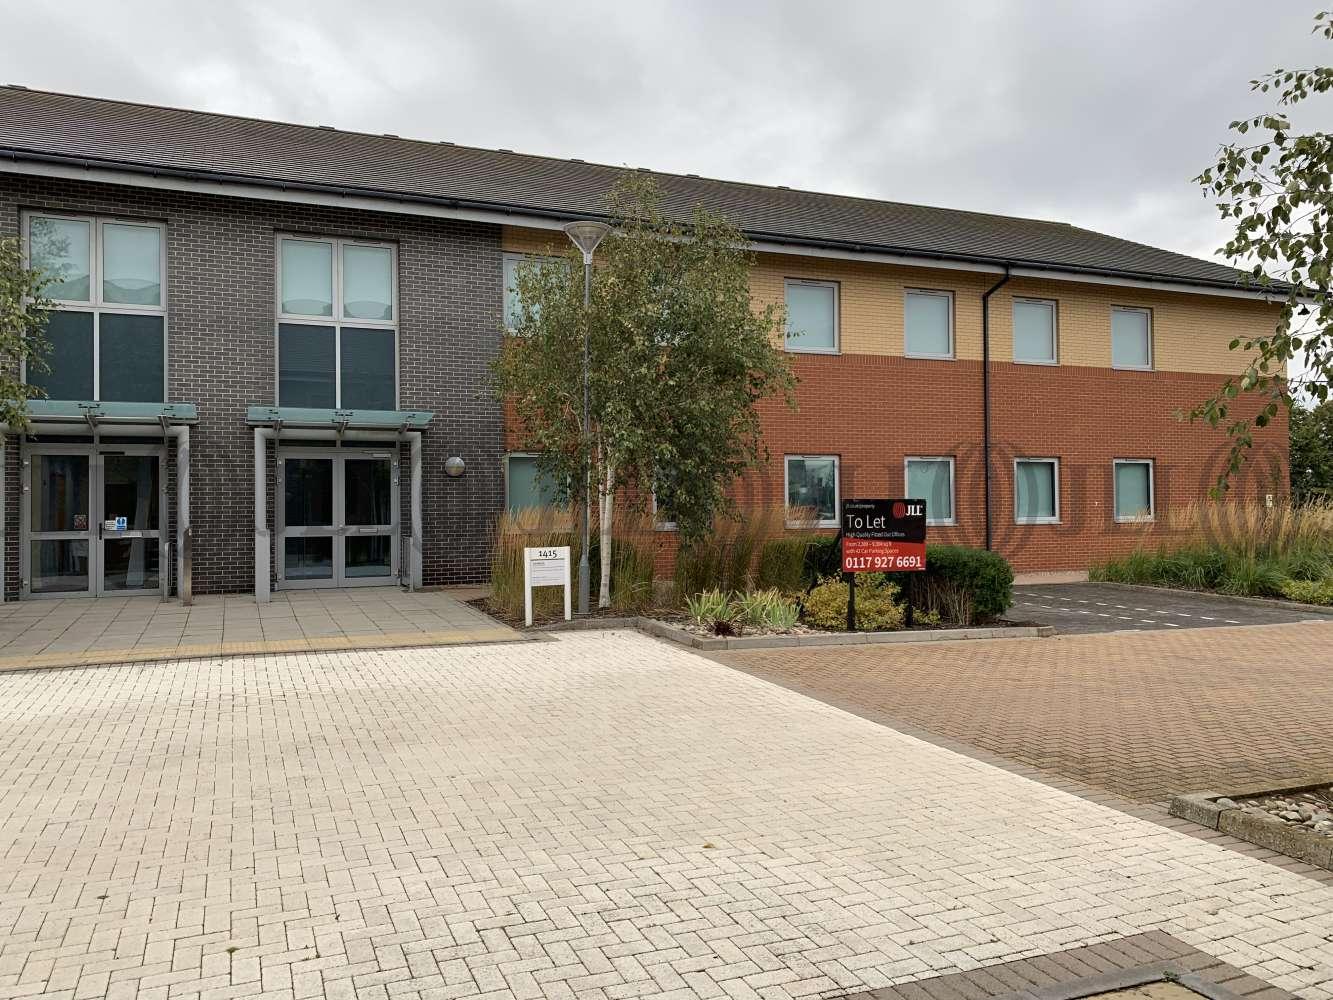 Office Gloucester, GL3 4AE - 1414/1415 Gloucester Business Park - 19